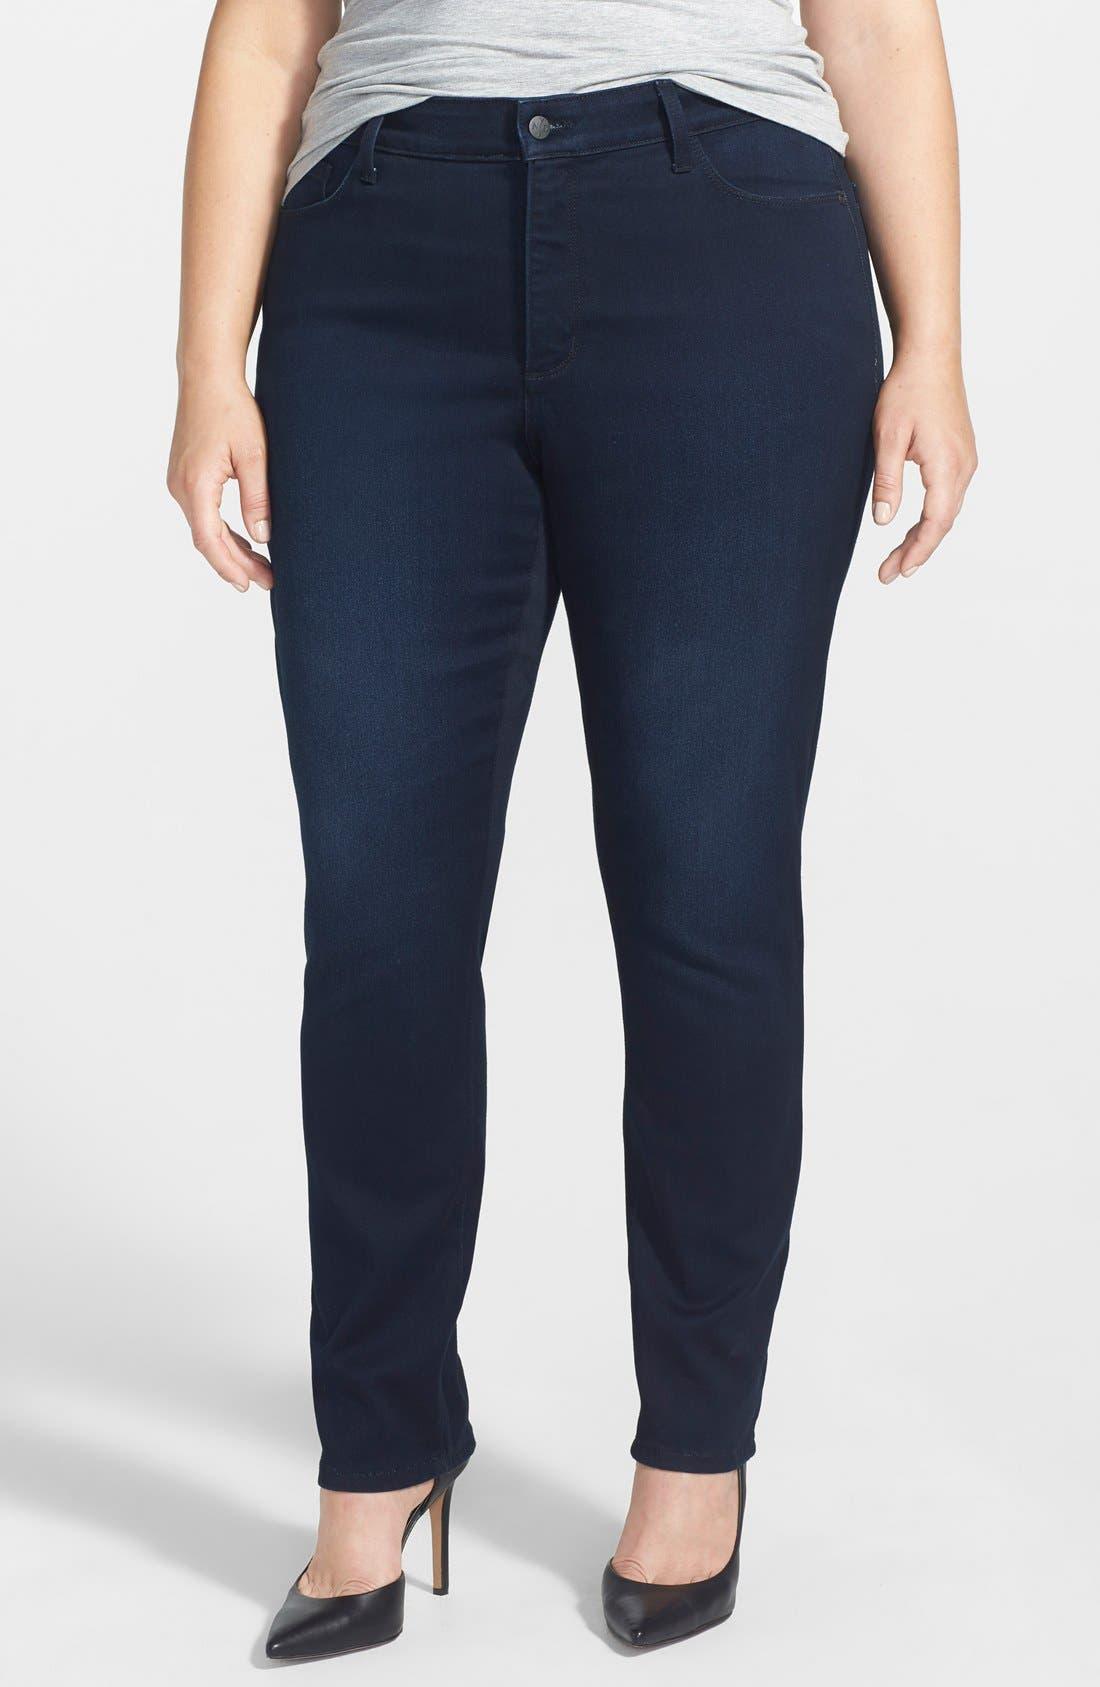 Main Image - NYDJ 'Jade' Stretch Skinny Jeans (Norwell) (Plus Size)